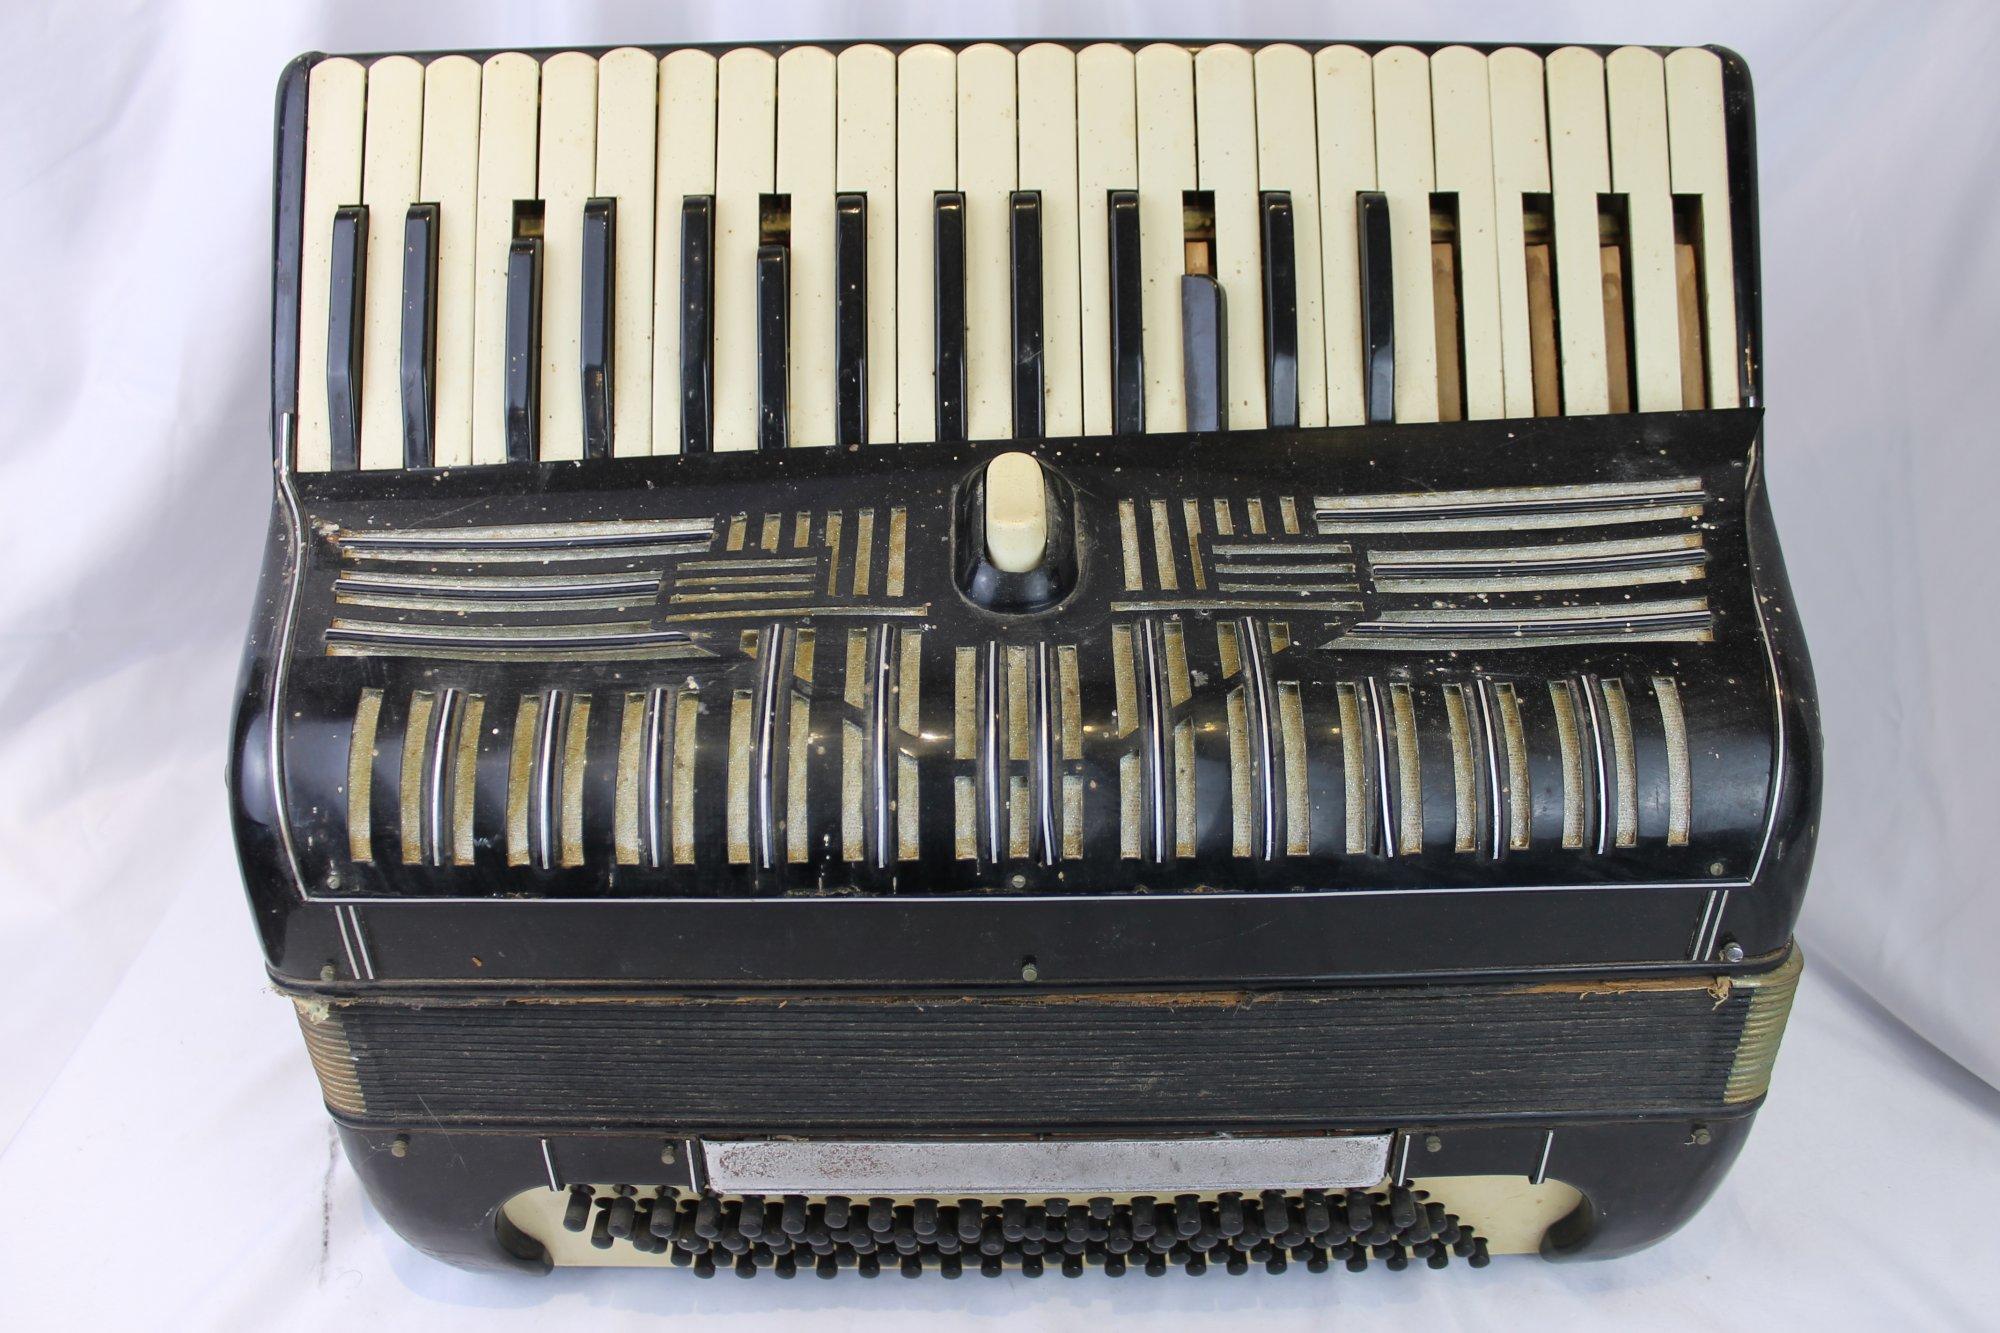 4564 - Black Piano Accordion LMM 41 120 - For Parts or Repair